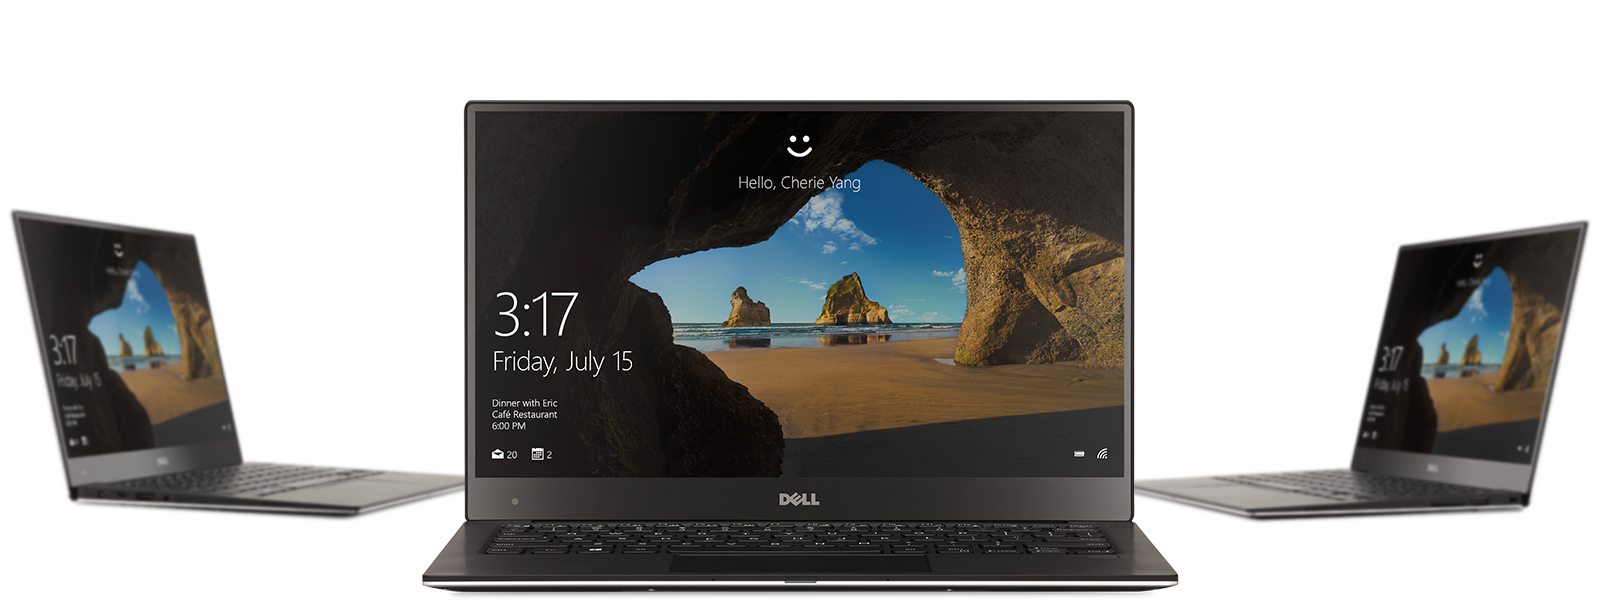 Imagen grupal de HP Spectre, Lenovo Yoga y Surface Studio.